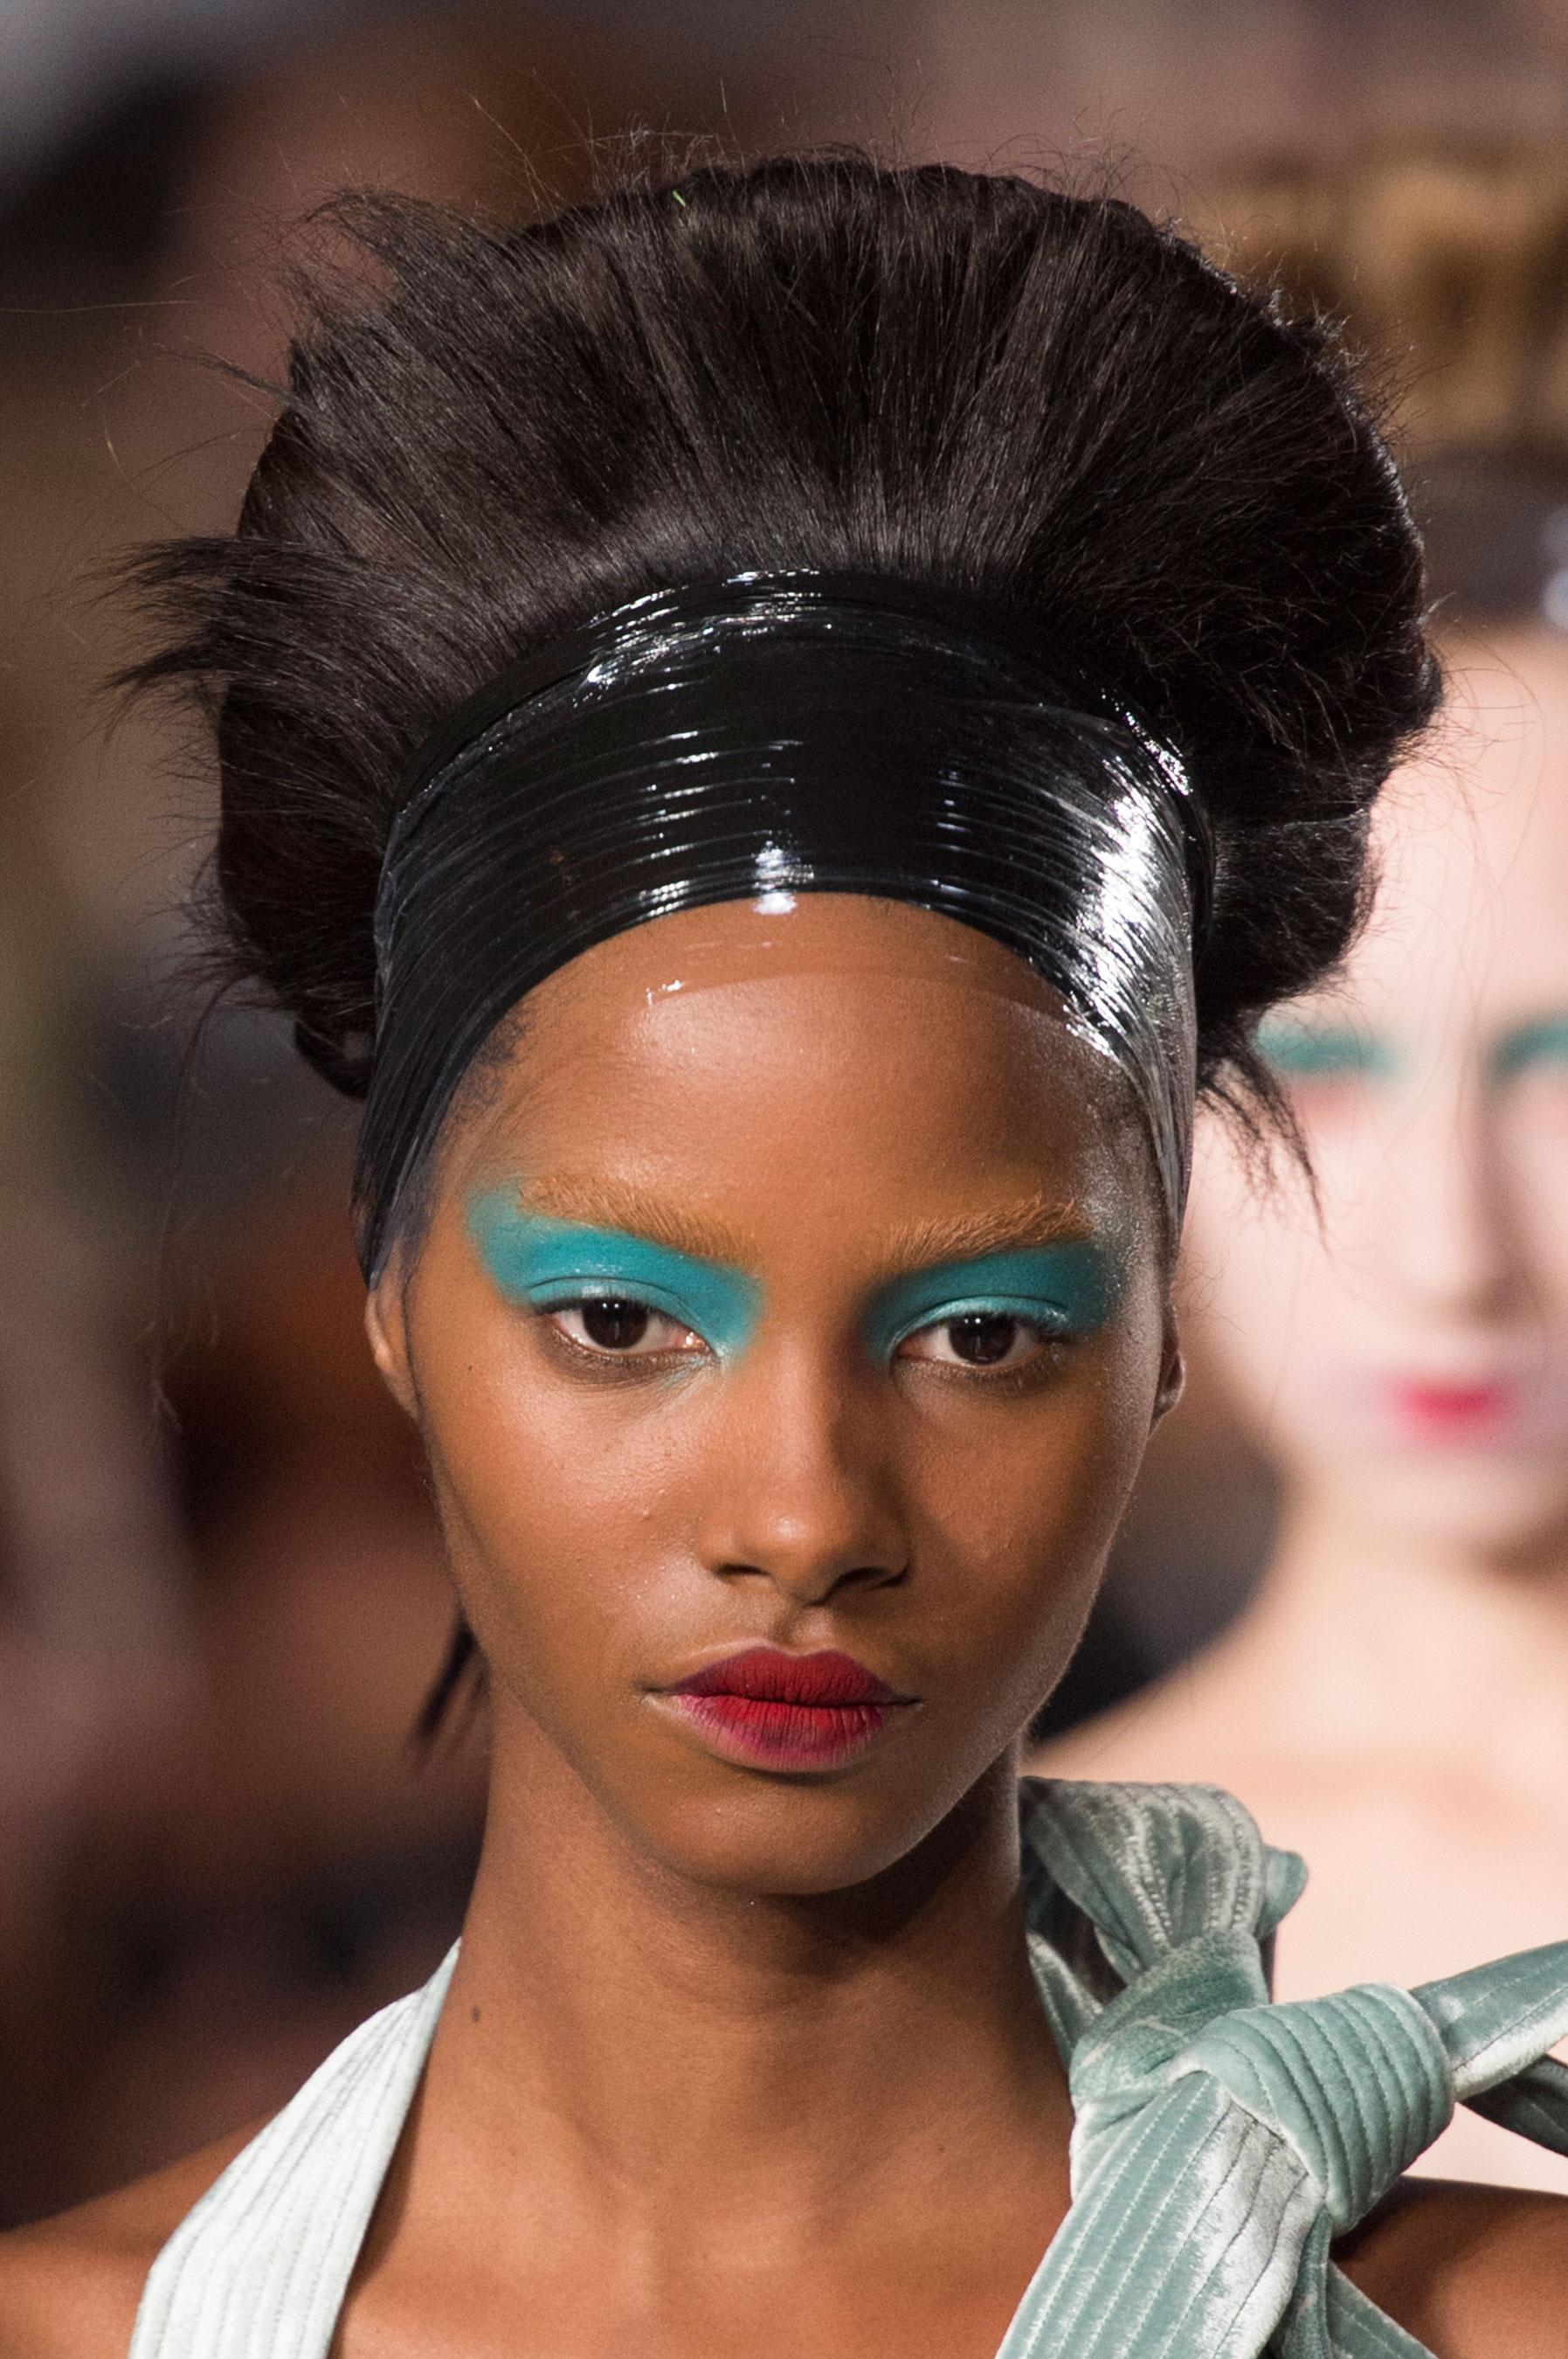 Maison-Margiela-spring-2016-runway-beauty-fashion-show-the-impression-089